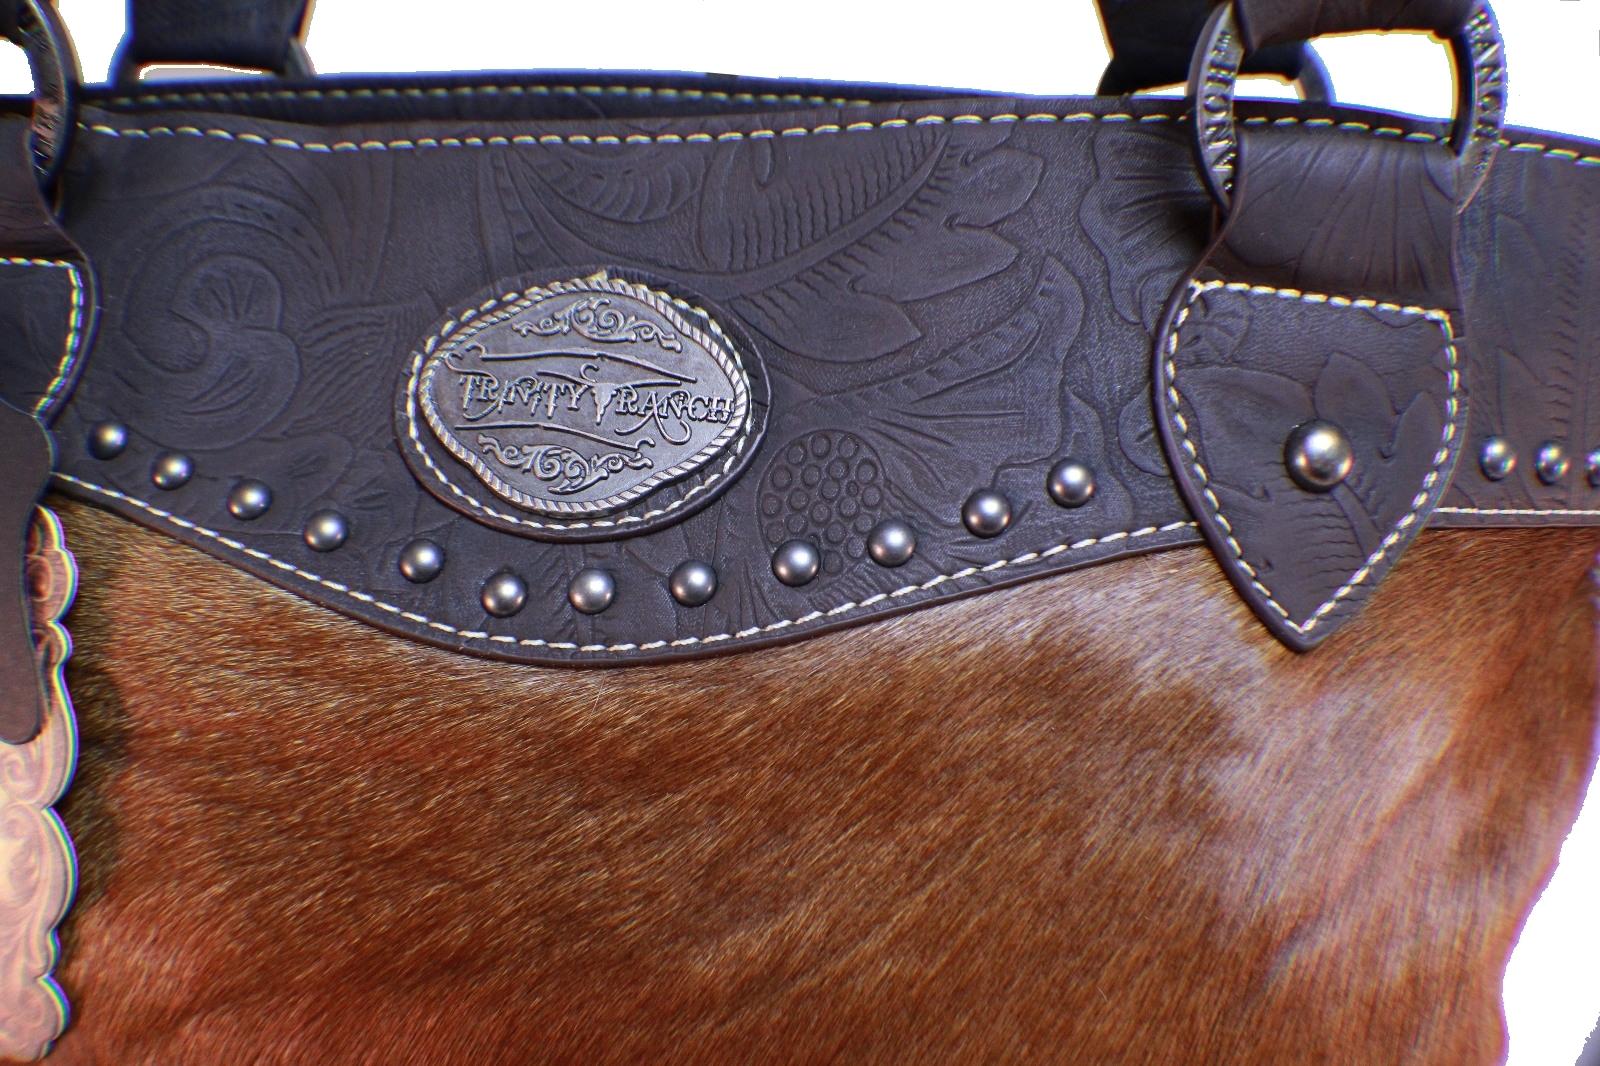 cb05001324 Montana trail trinity ranch montana west leather purse cowhide handbag jpg  1600x1066 Mountain west handbags and